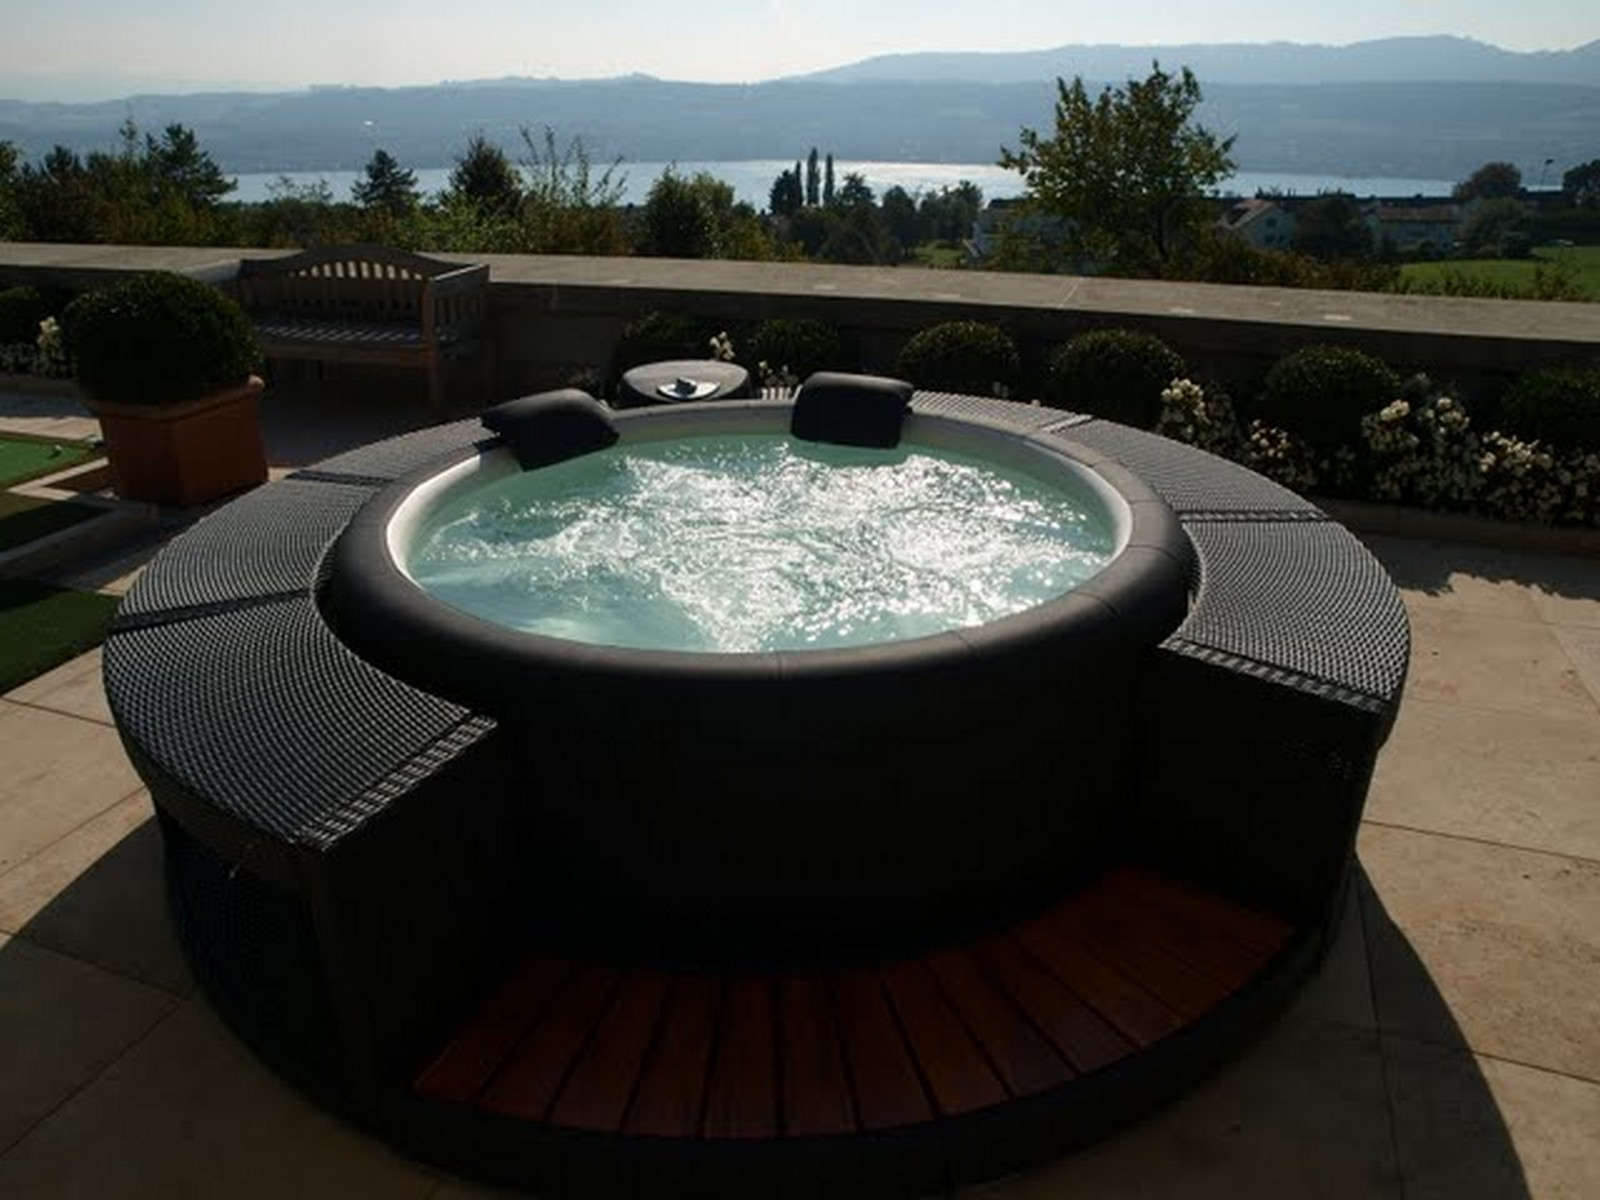 softub 300 resort softub hidromasa ni bazen hidromasa ni bazeni softub softub. Black Bedroom Furniture Sets. Home Design Ideas